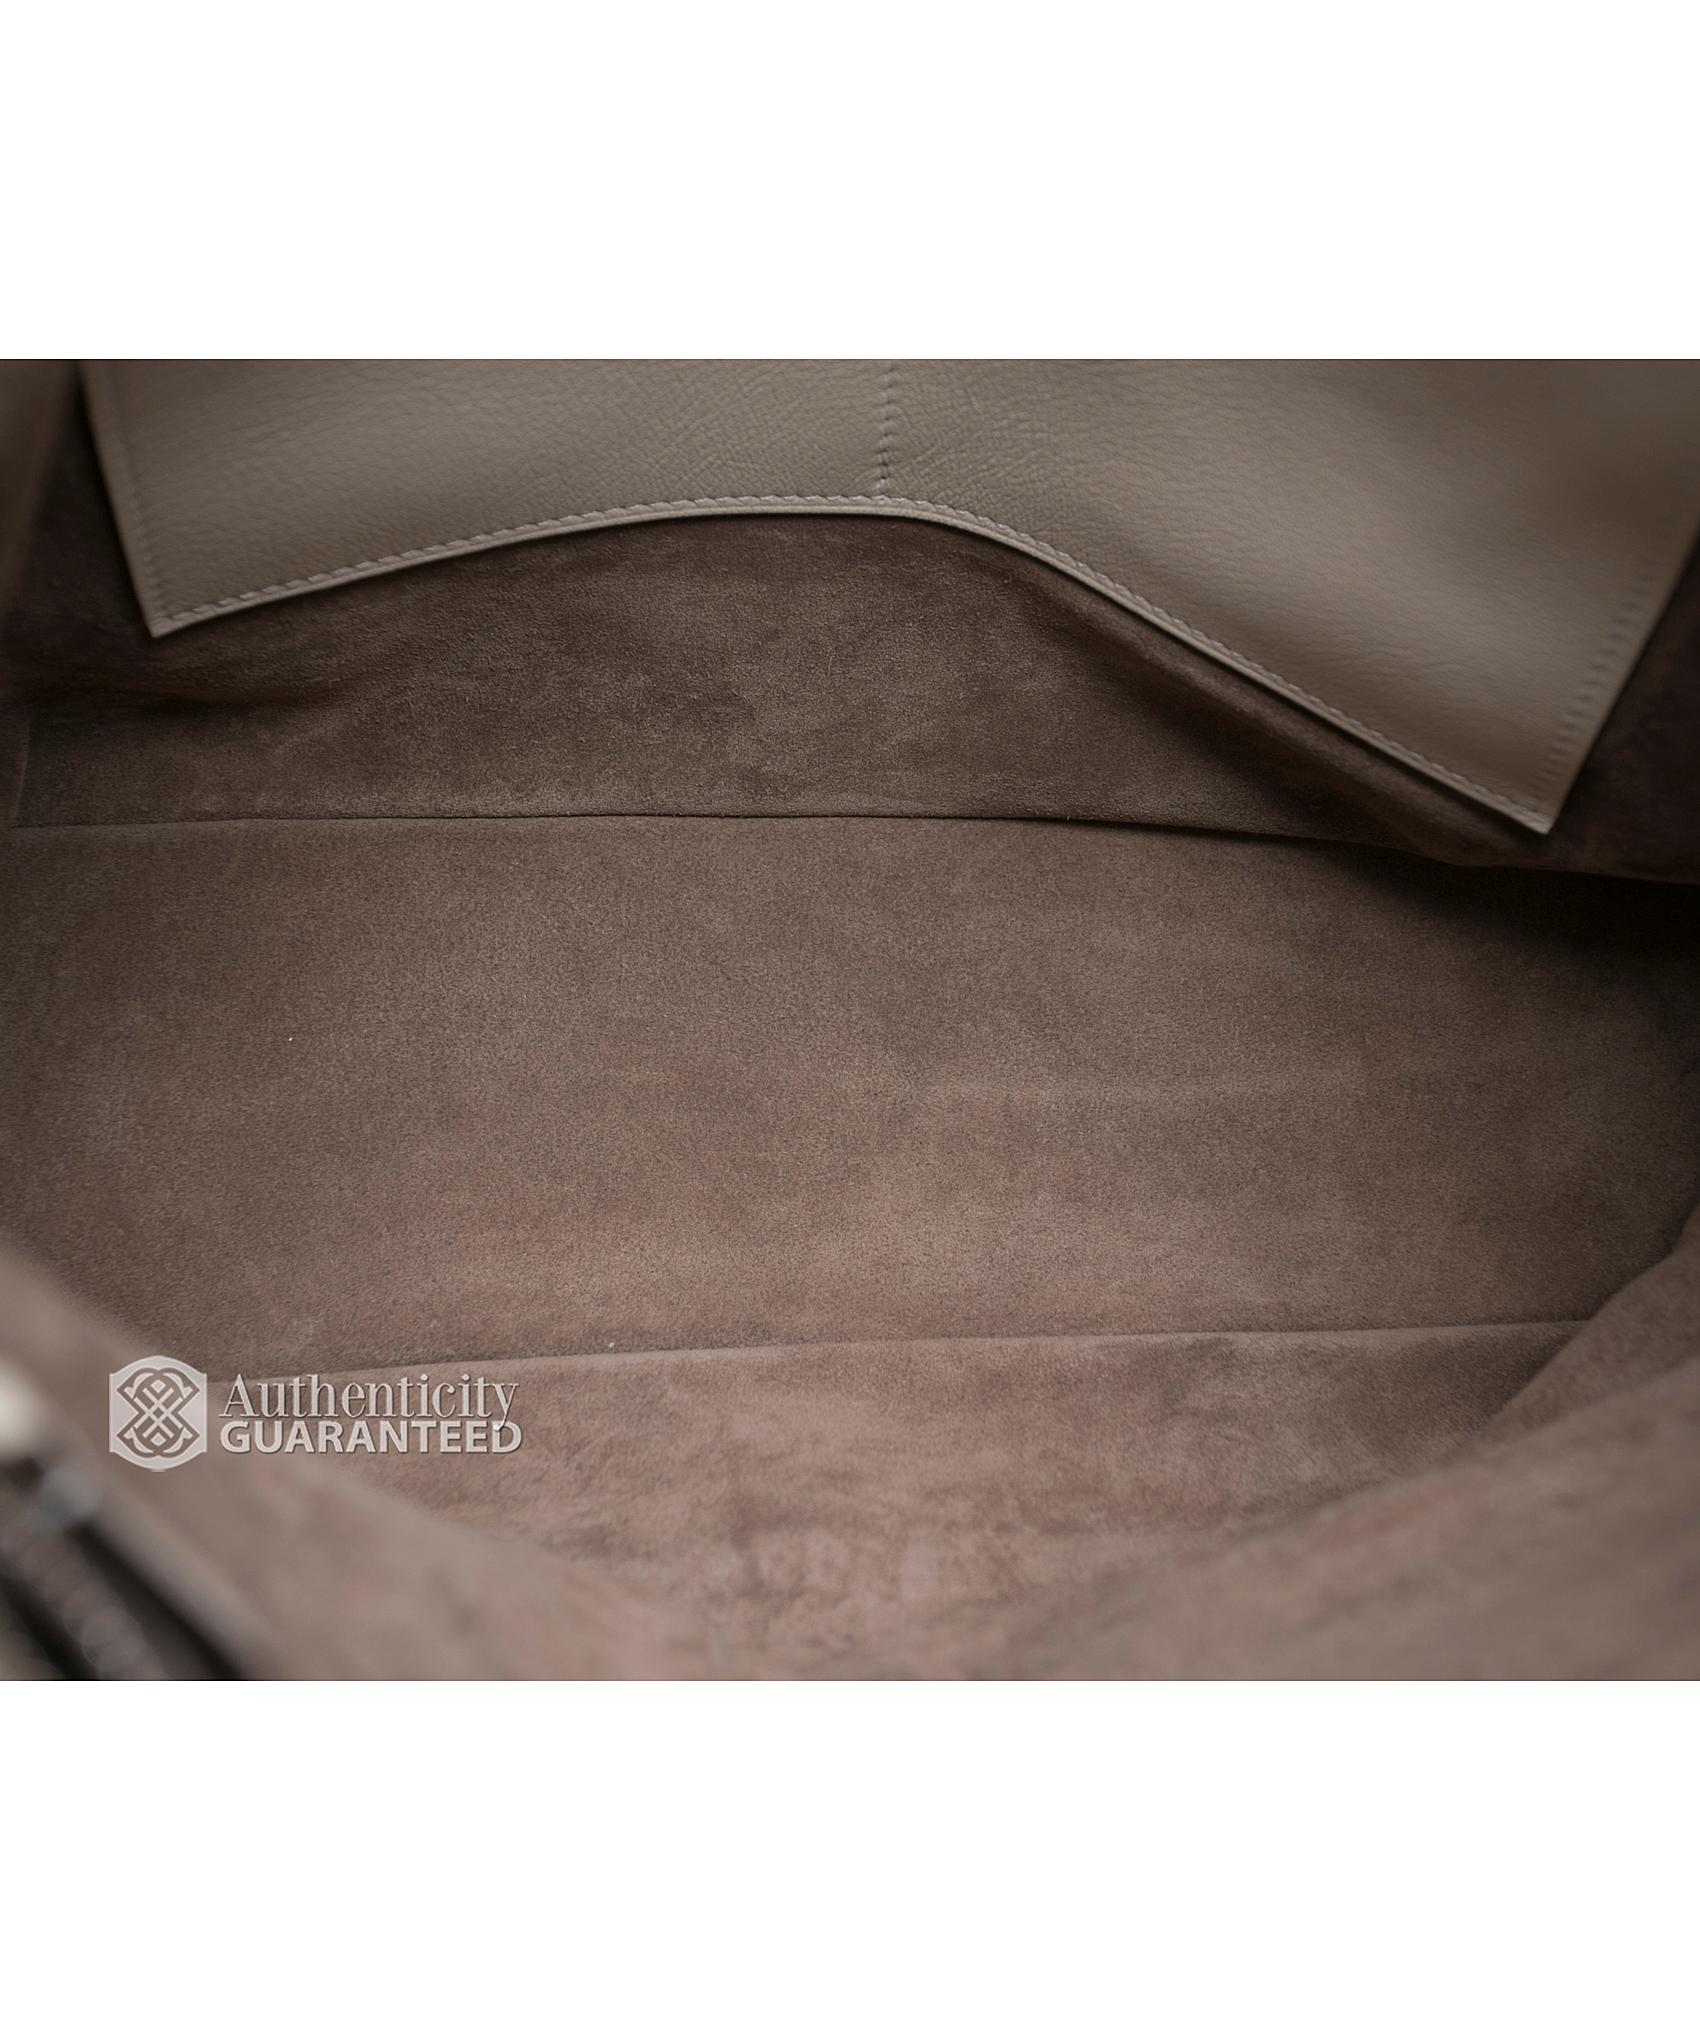 louis vuitton pre owned blanc casse veau soie leather bagatelle bag in white lyst. Black Bedroom Furniture Sets. Home Design Ideas